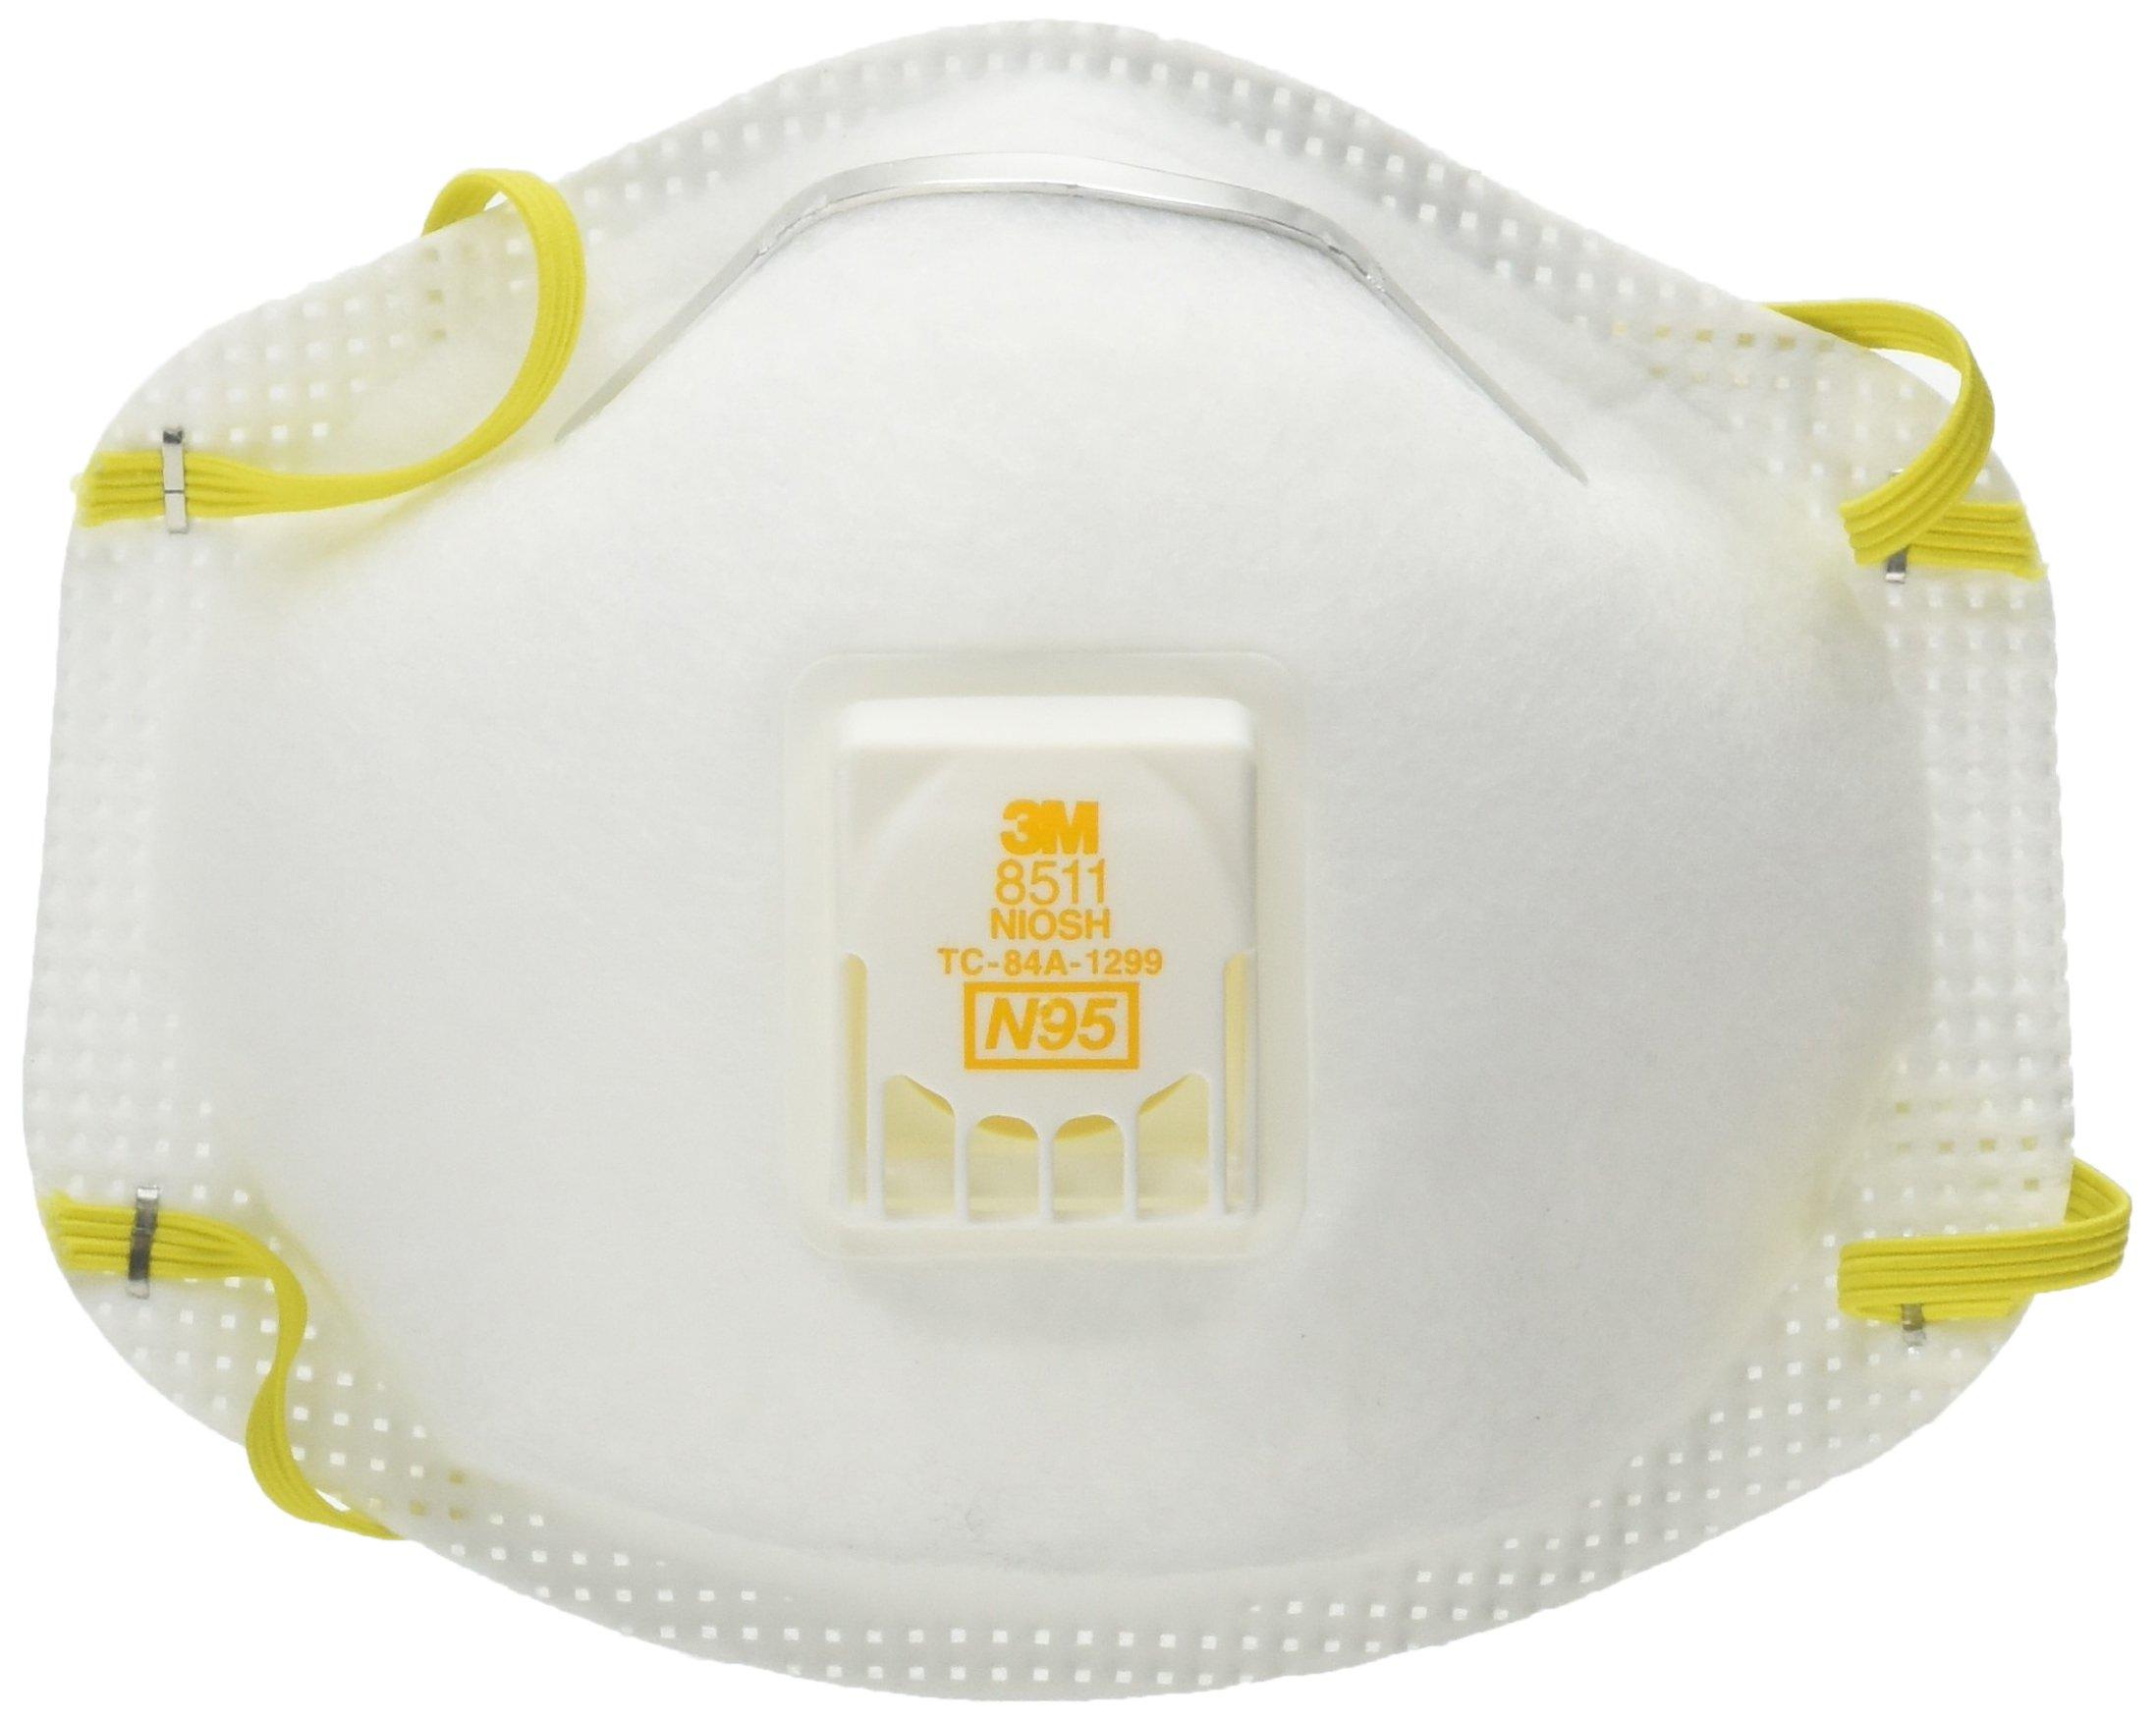 ESD8511 3MTM Particulate Respirator 8511(10 PER BOX)